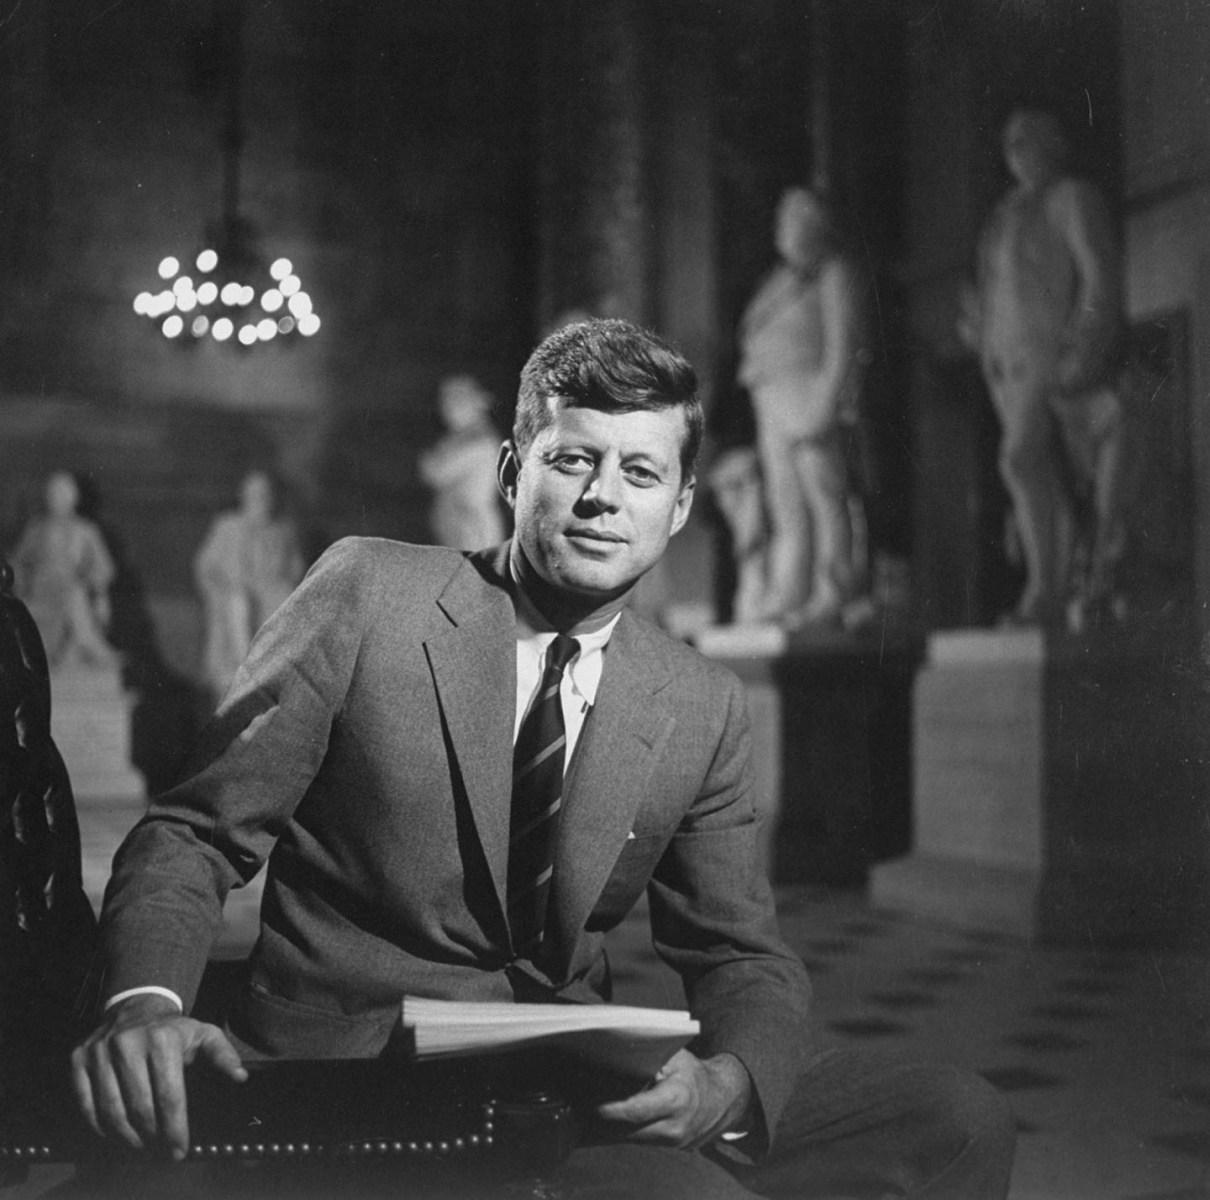 Remembering John . Kennedy' Life And Legacy - Insidehook